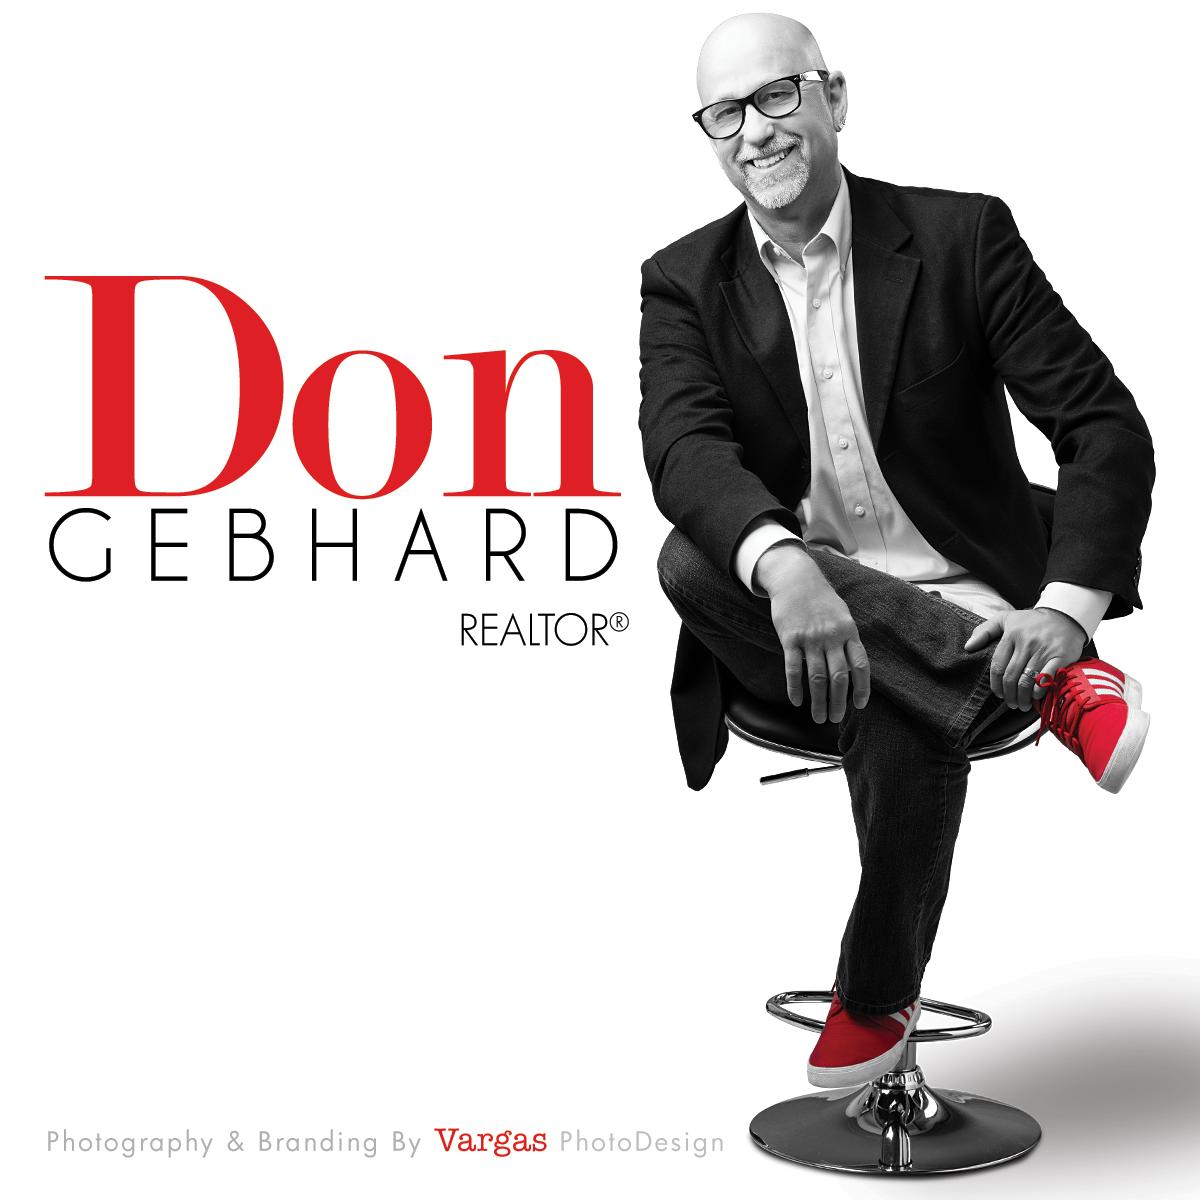 Don-Gebhard-Realtor-Branding-2.png